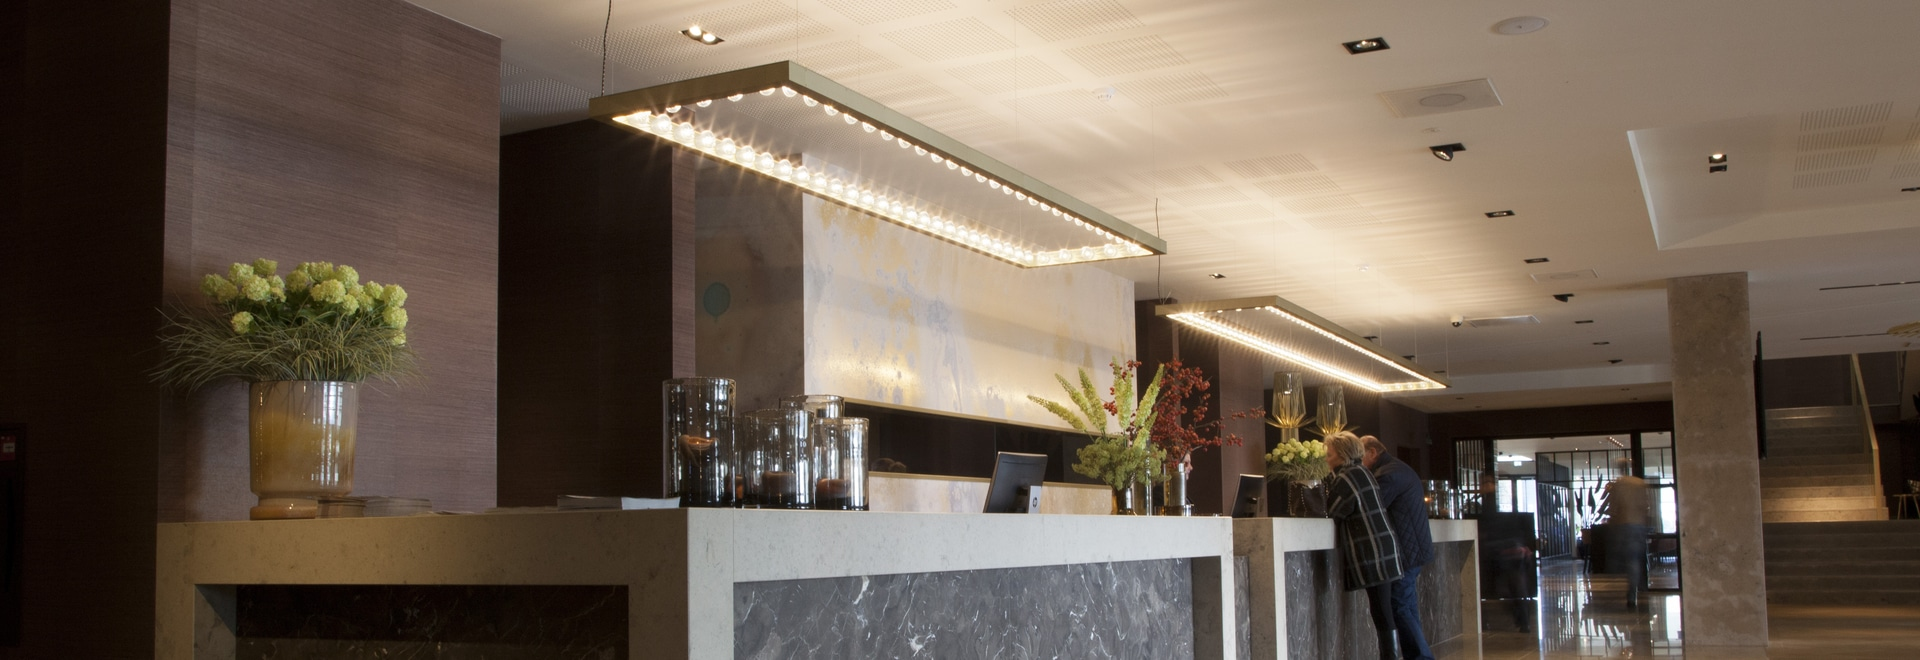 JSPR new collection Framed and Wall Lines at the Van der Valk Hotel Enschede